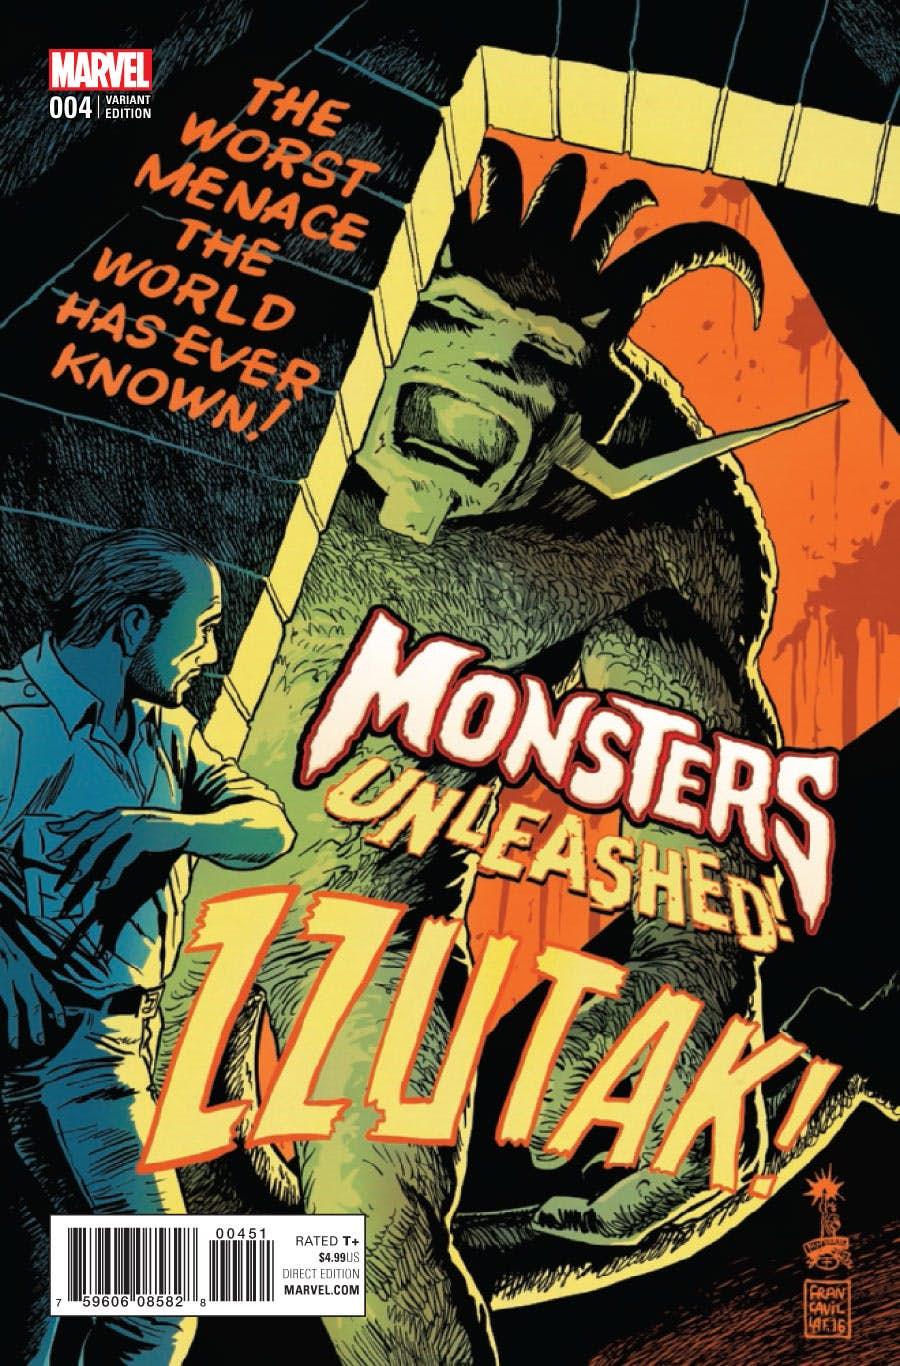 Monsters Unleashed Vol 2 4 50's Movie Poster Variant.jpg